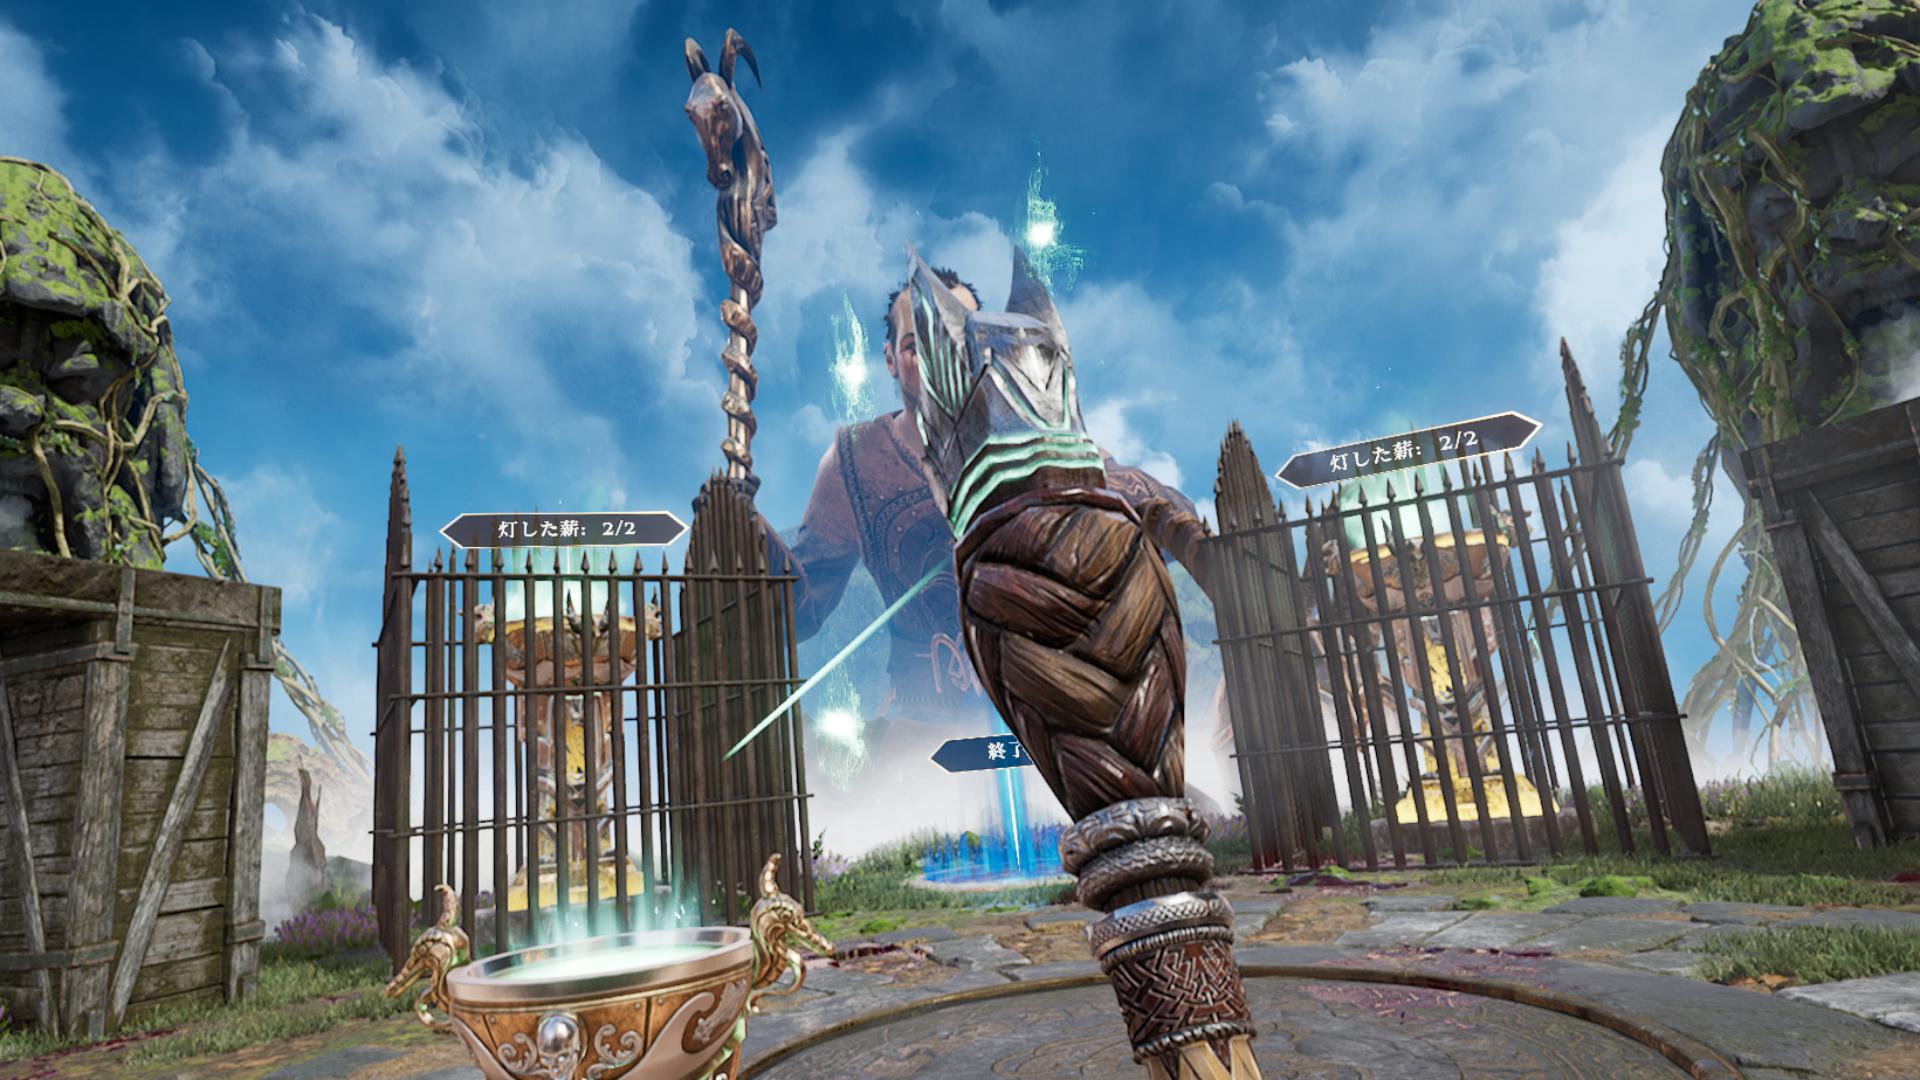 【Asgard's Wrath】攻略 剣と盾の戦い